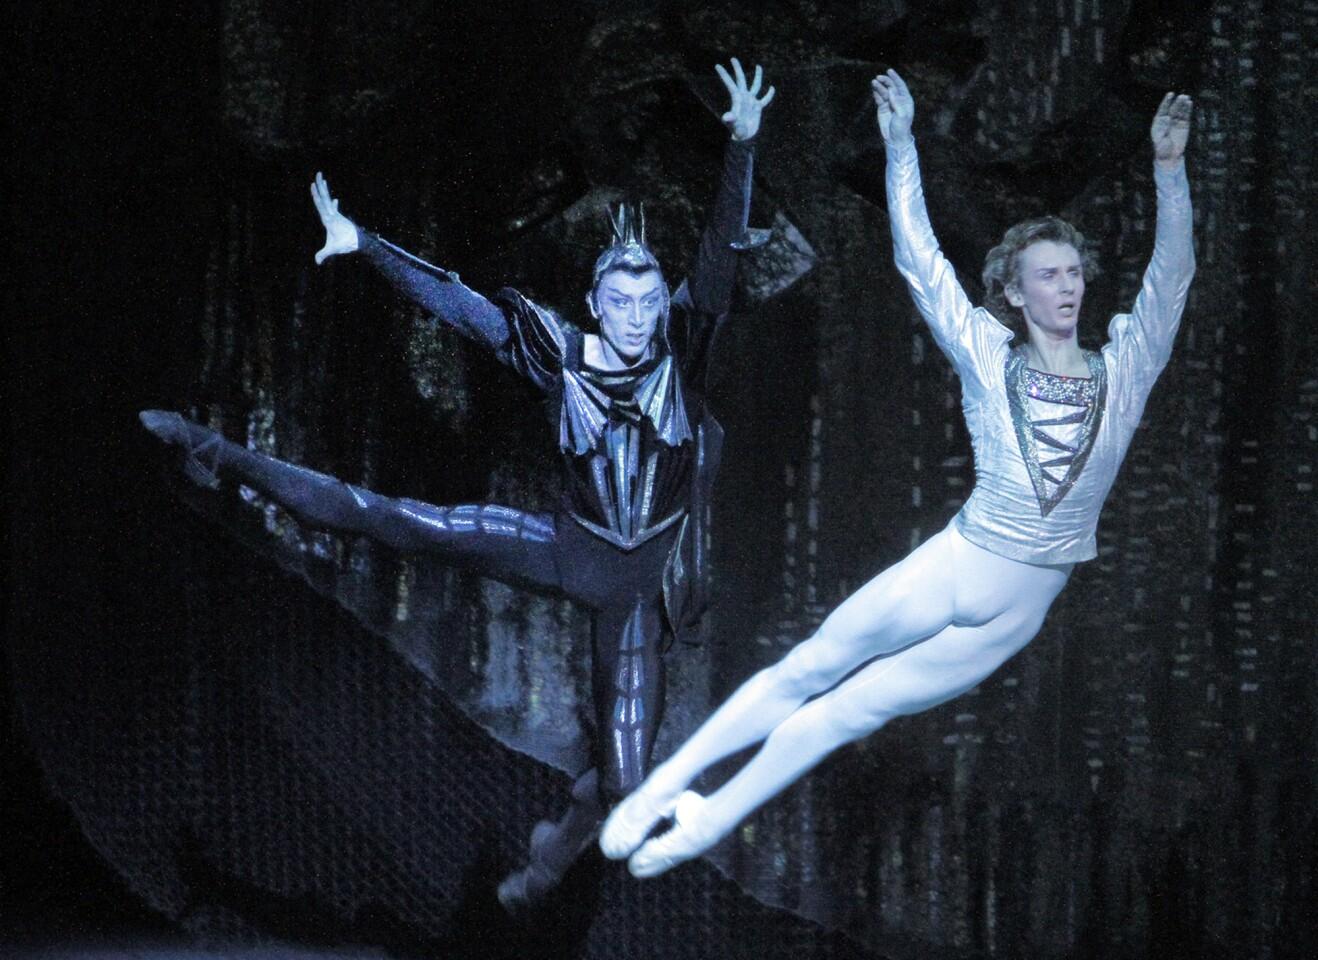 Bolshoi Ballet visits L.A. with 'Swan Lake'